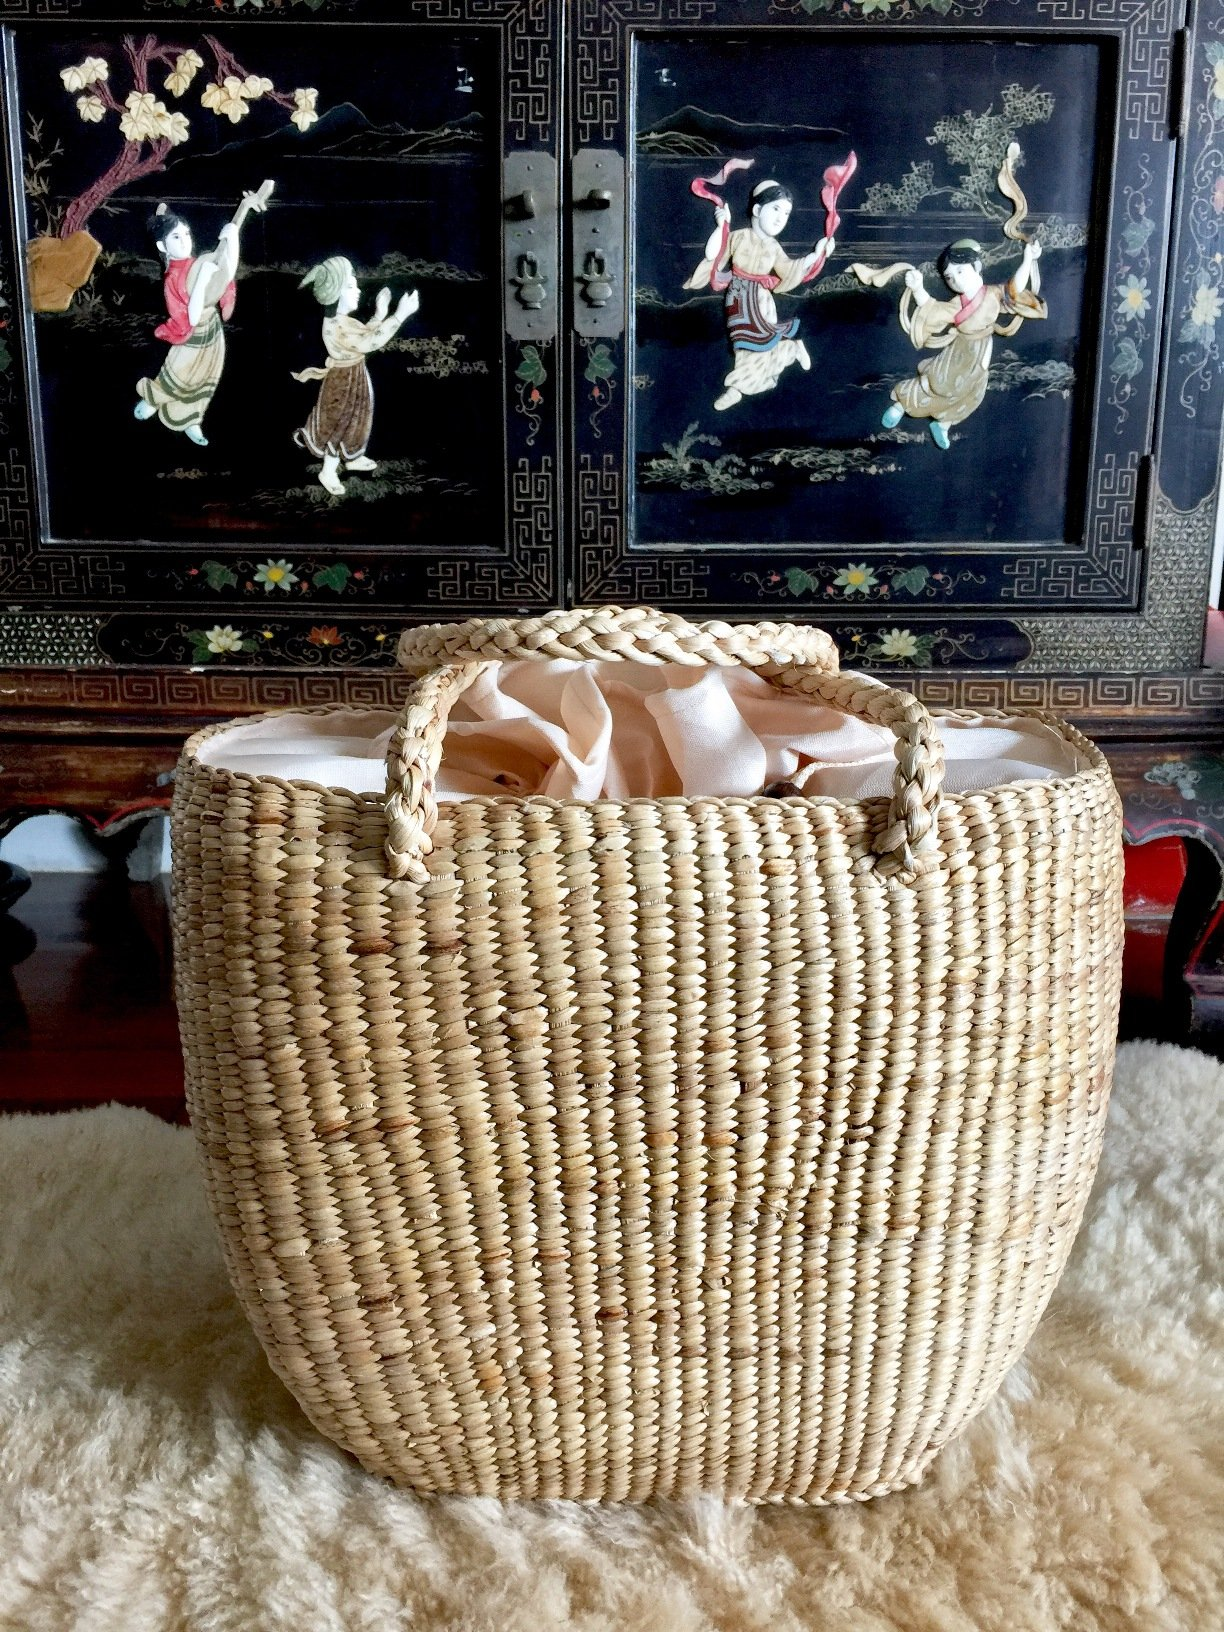 Large Straw Beach Basket,Straw Basket Tote,Straw Bag,Woven Straw Bag,Straw Tote